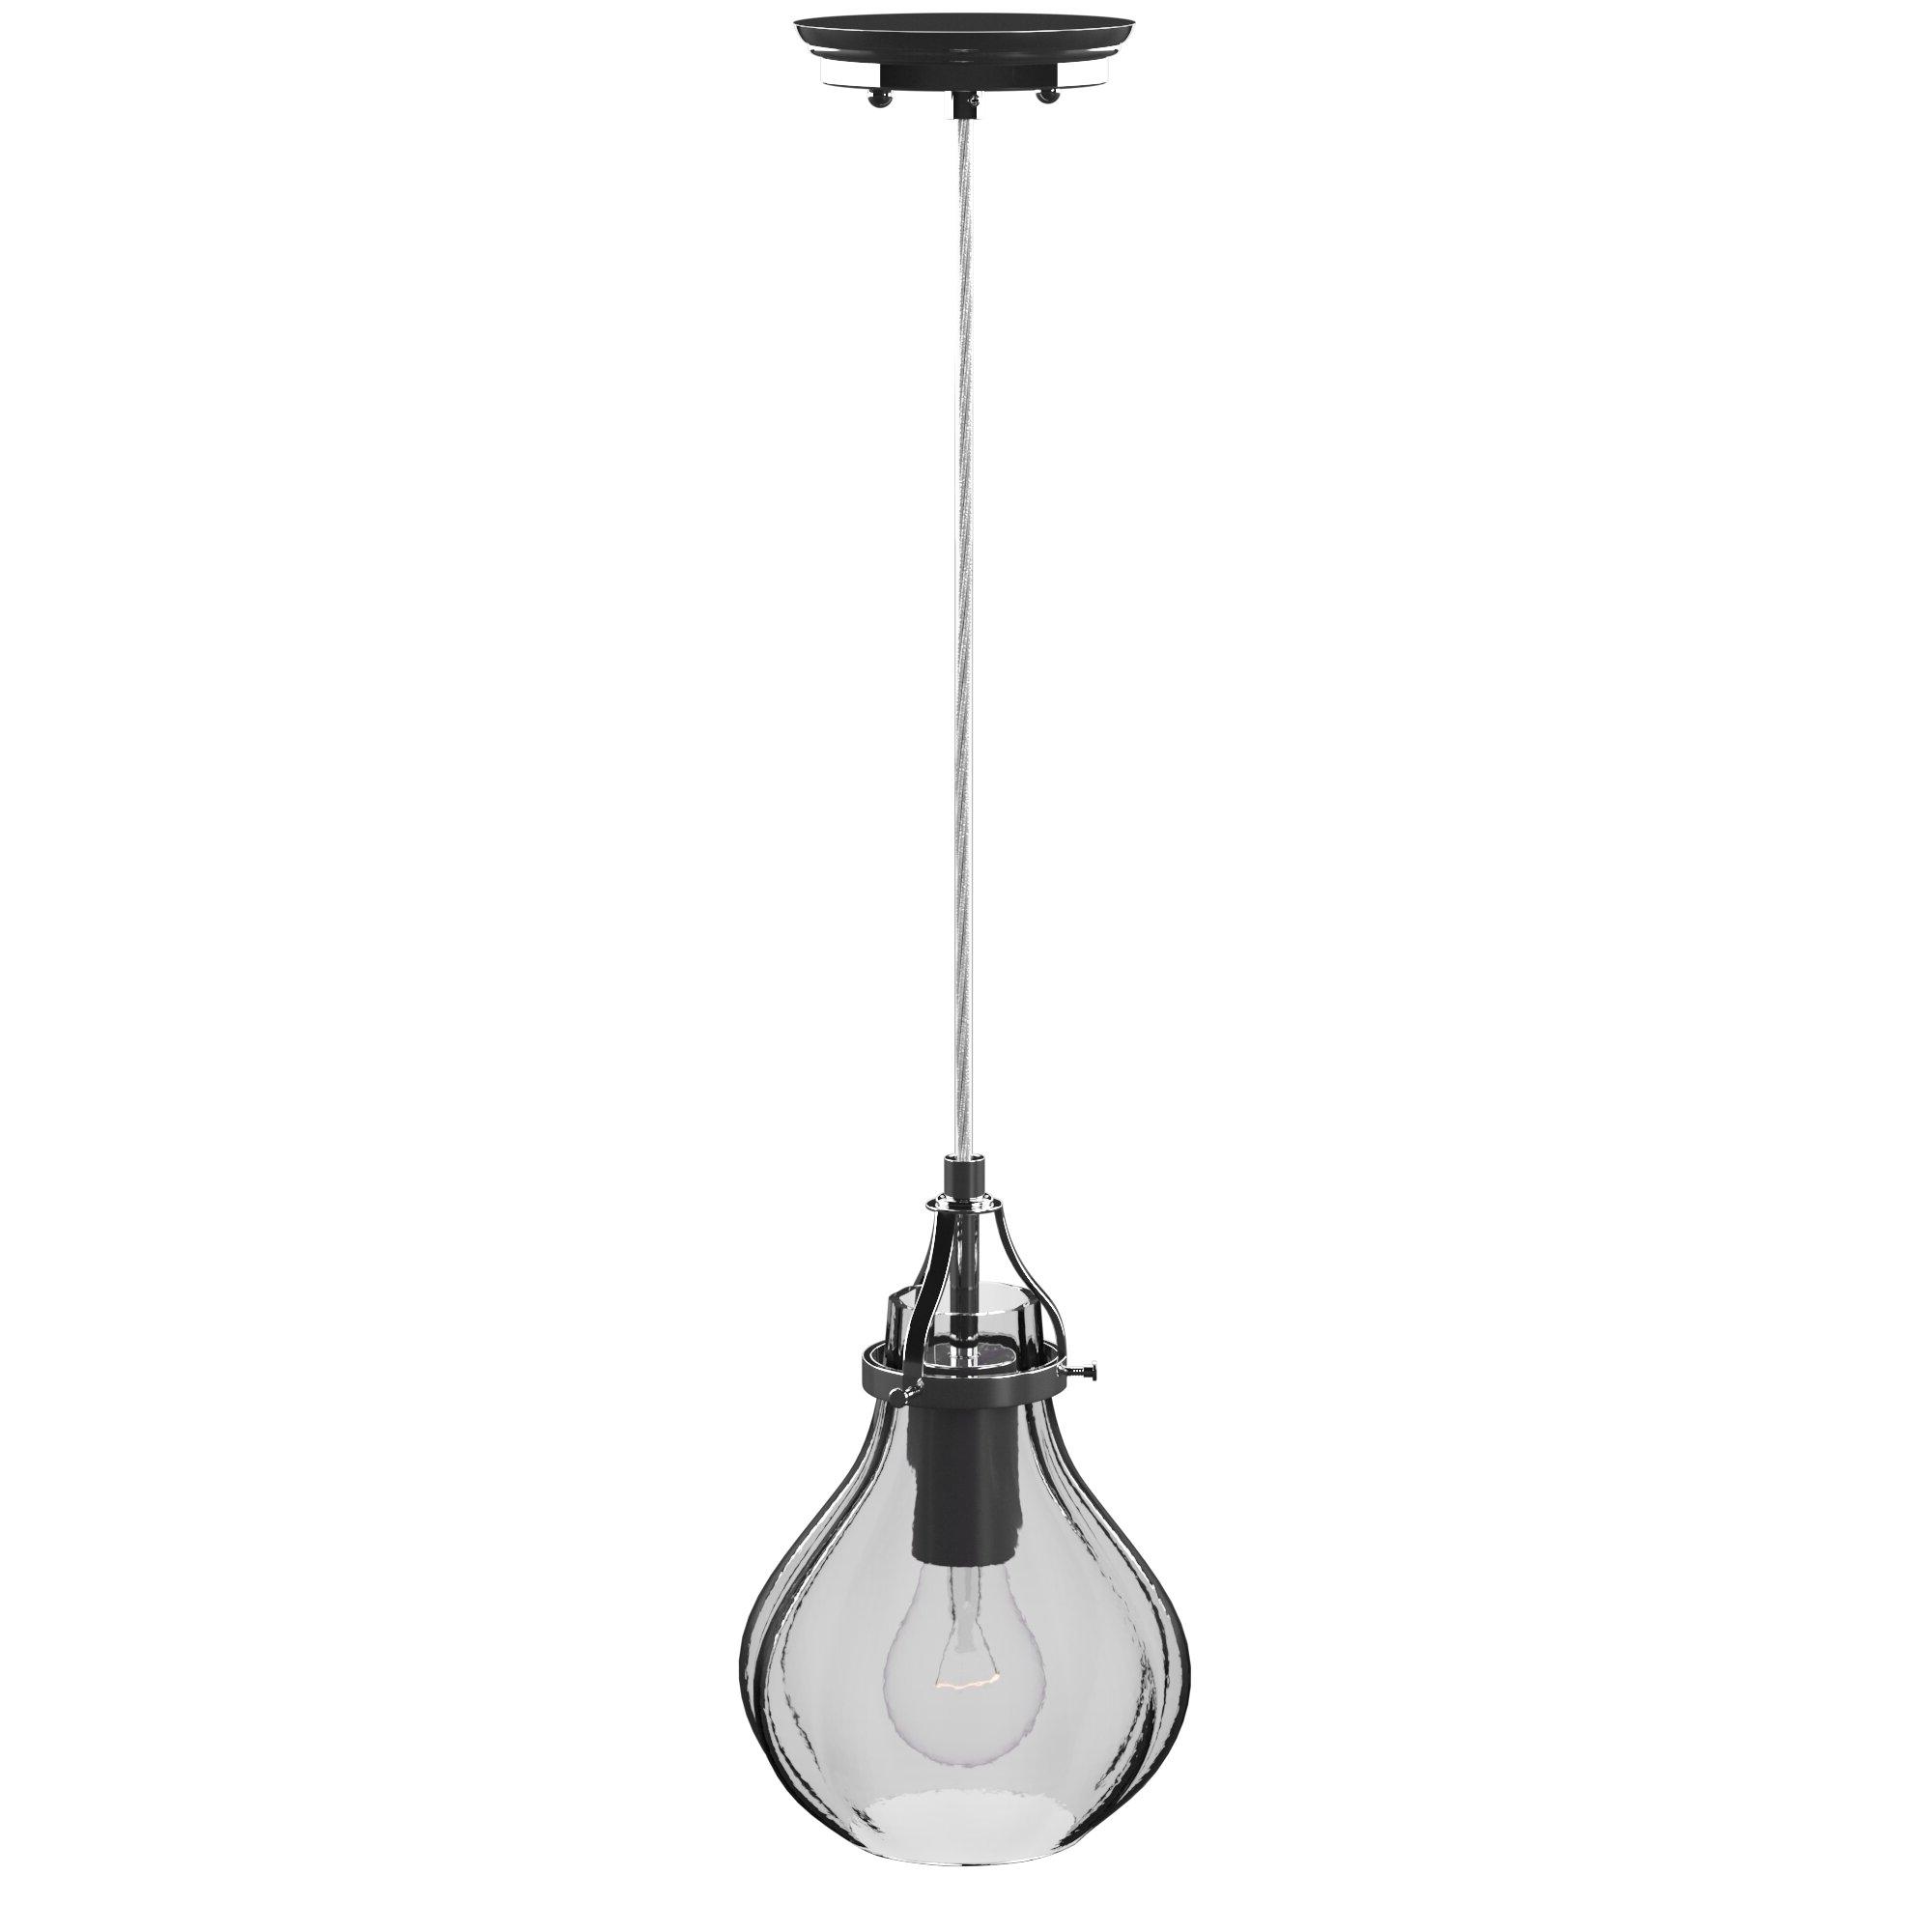 Most Recent 1 Light Single Teardrop Pendants Inside Orofino 1 Light Single Teardrop Pendant (View 13 of 20)